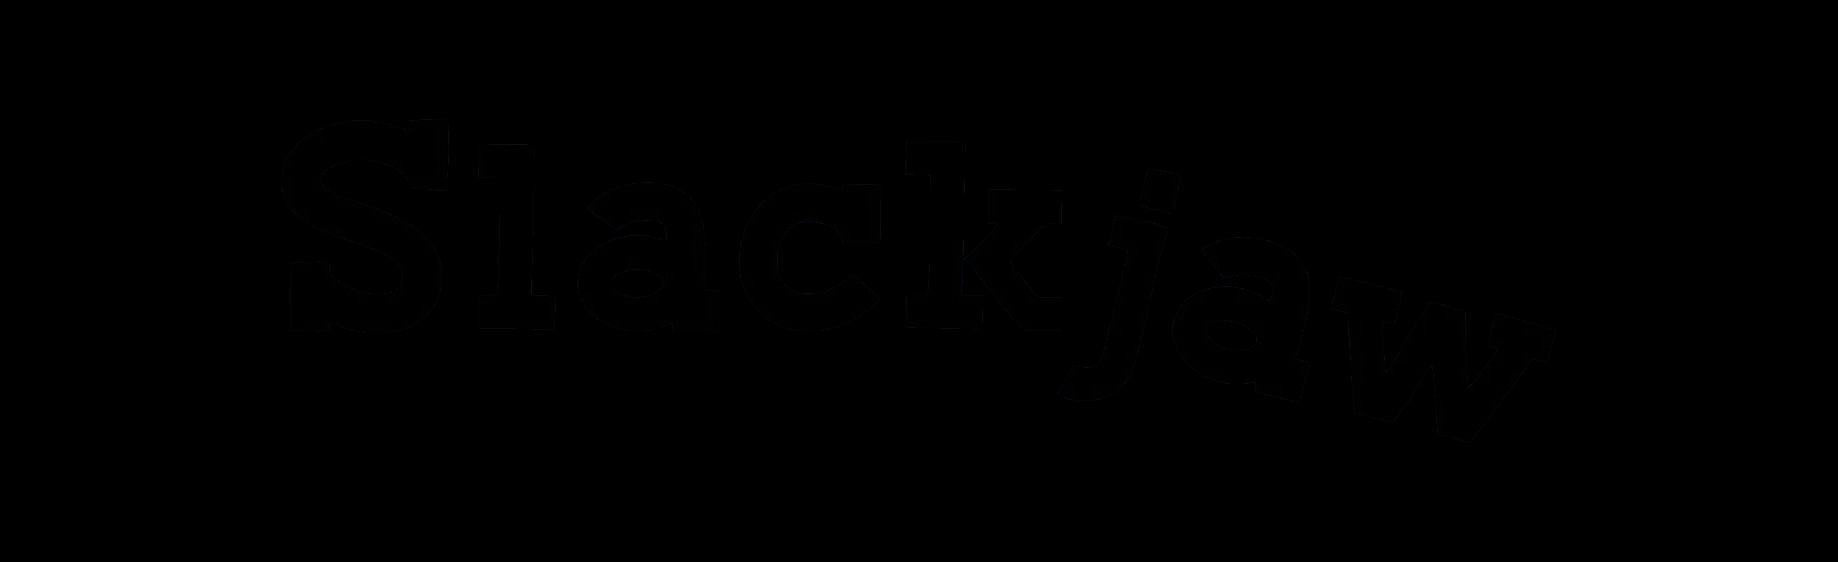 Slackjaw logo